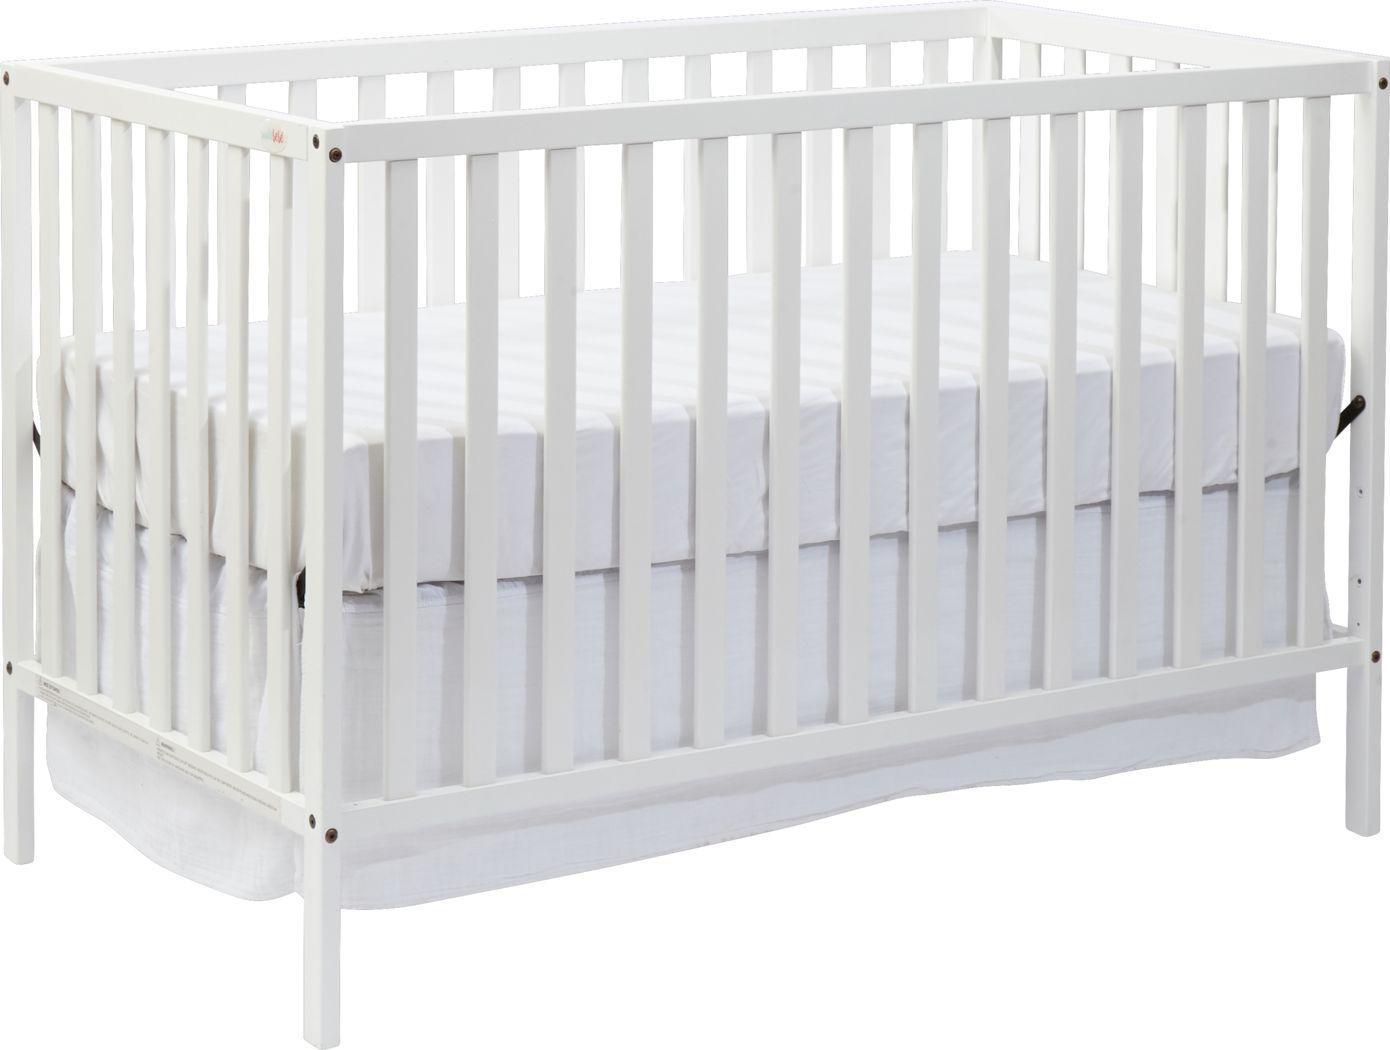 Kelby Cove White Convertible Crib In 2020 Convertible Crib